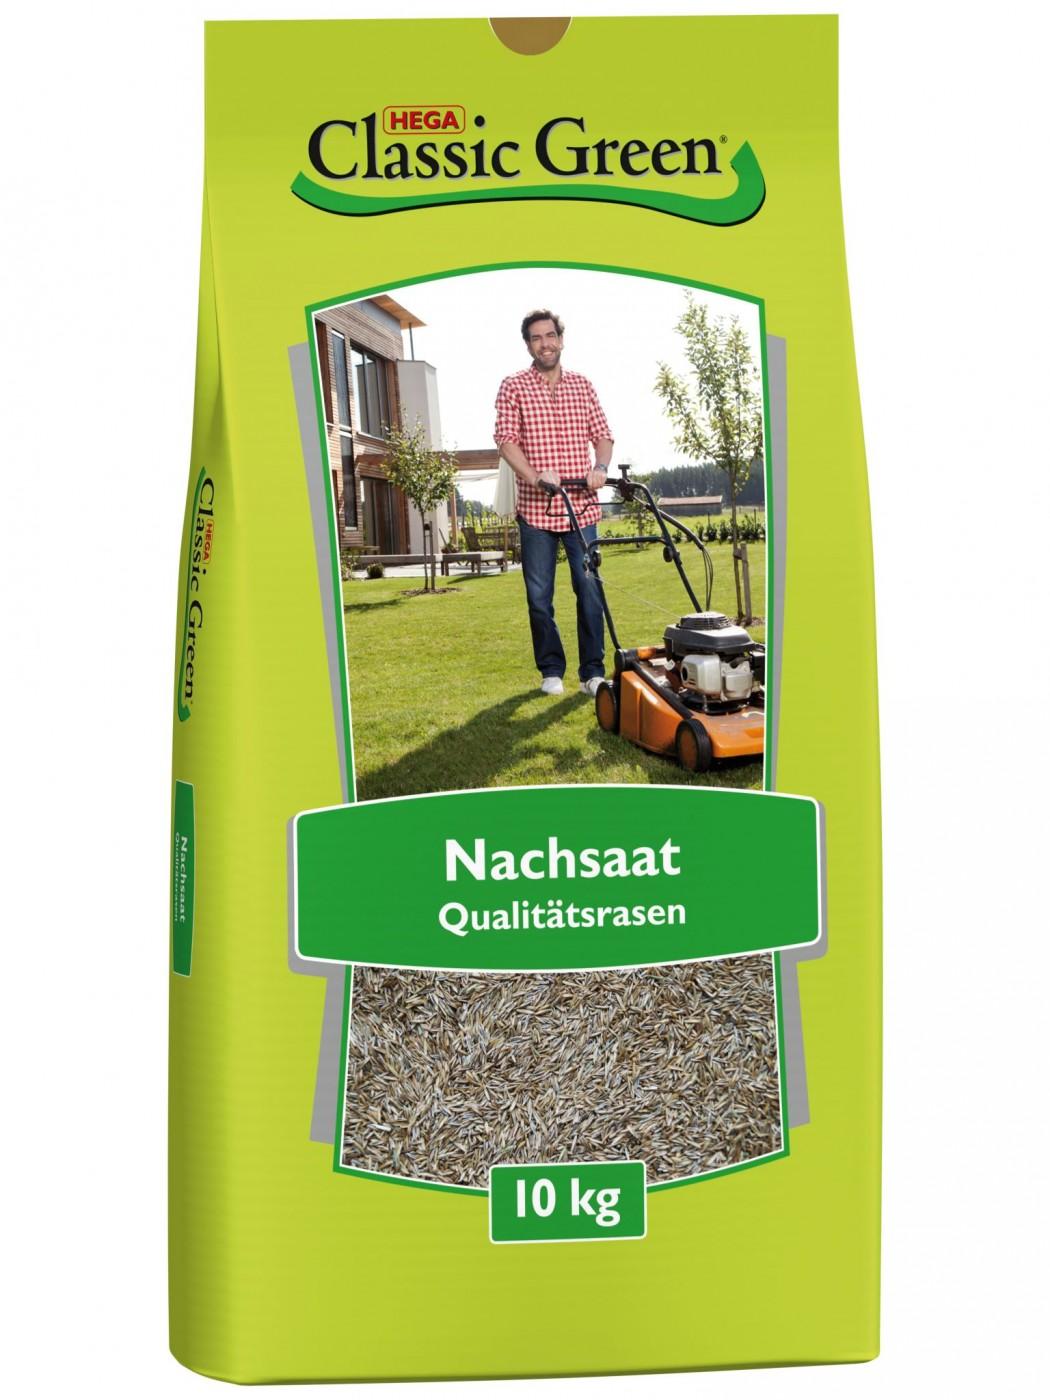 Classic Green Nachsaat-Reparatur   10kg Rasensaat